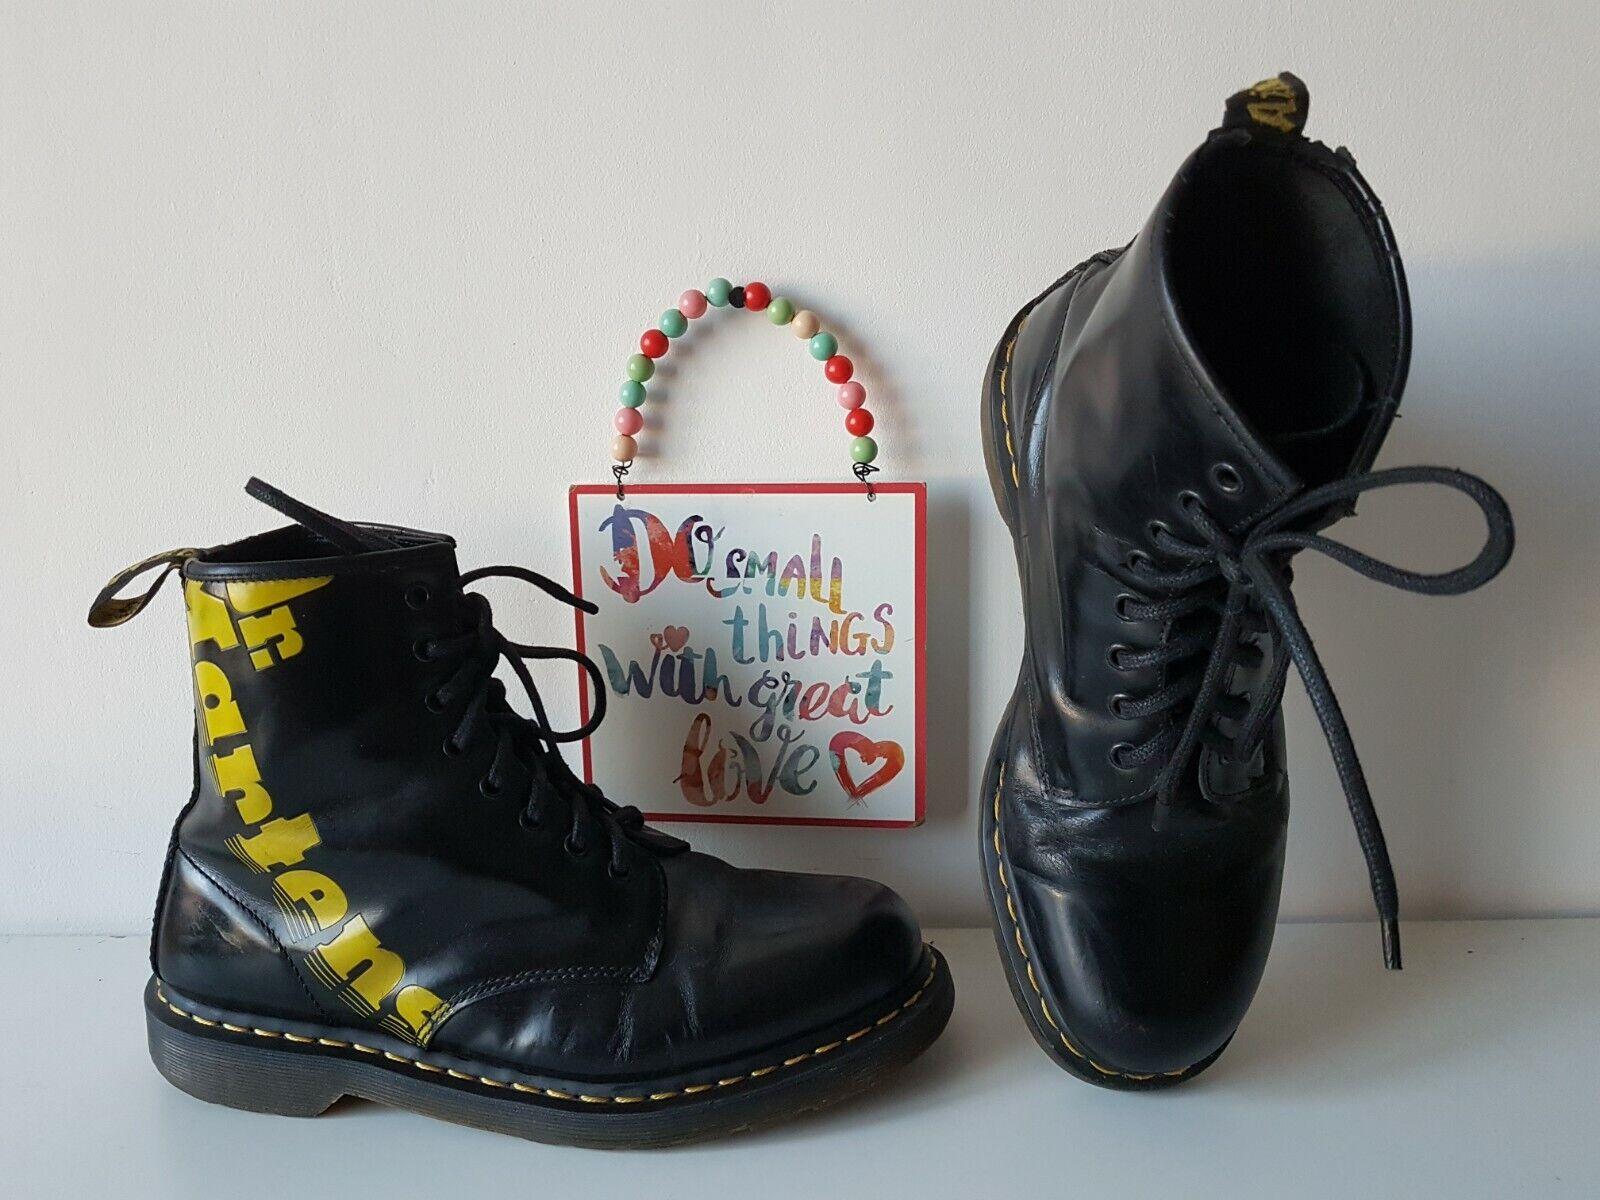 Dr Doc Martens 1460 8 eye brand logo yellow black boots UK 9.5 EU 44 US 10.5